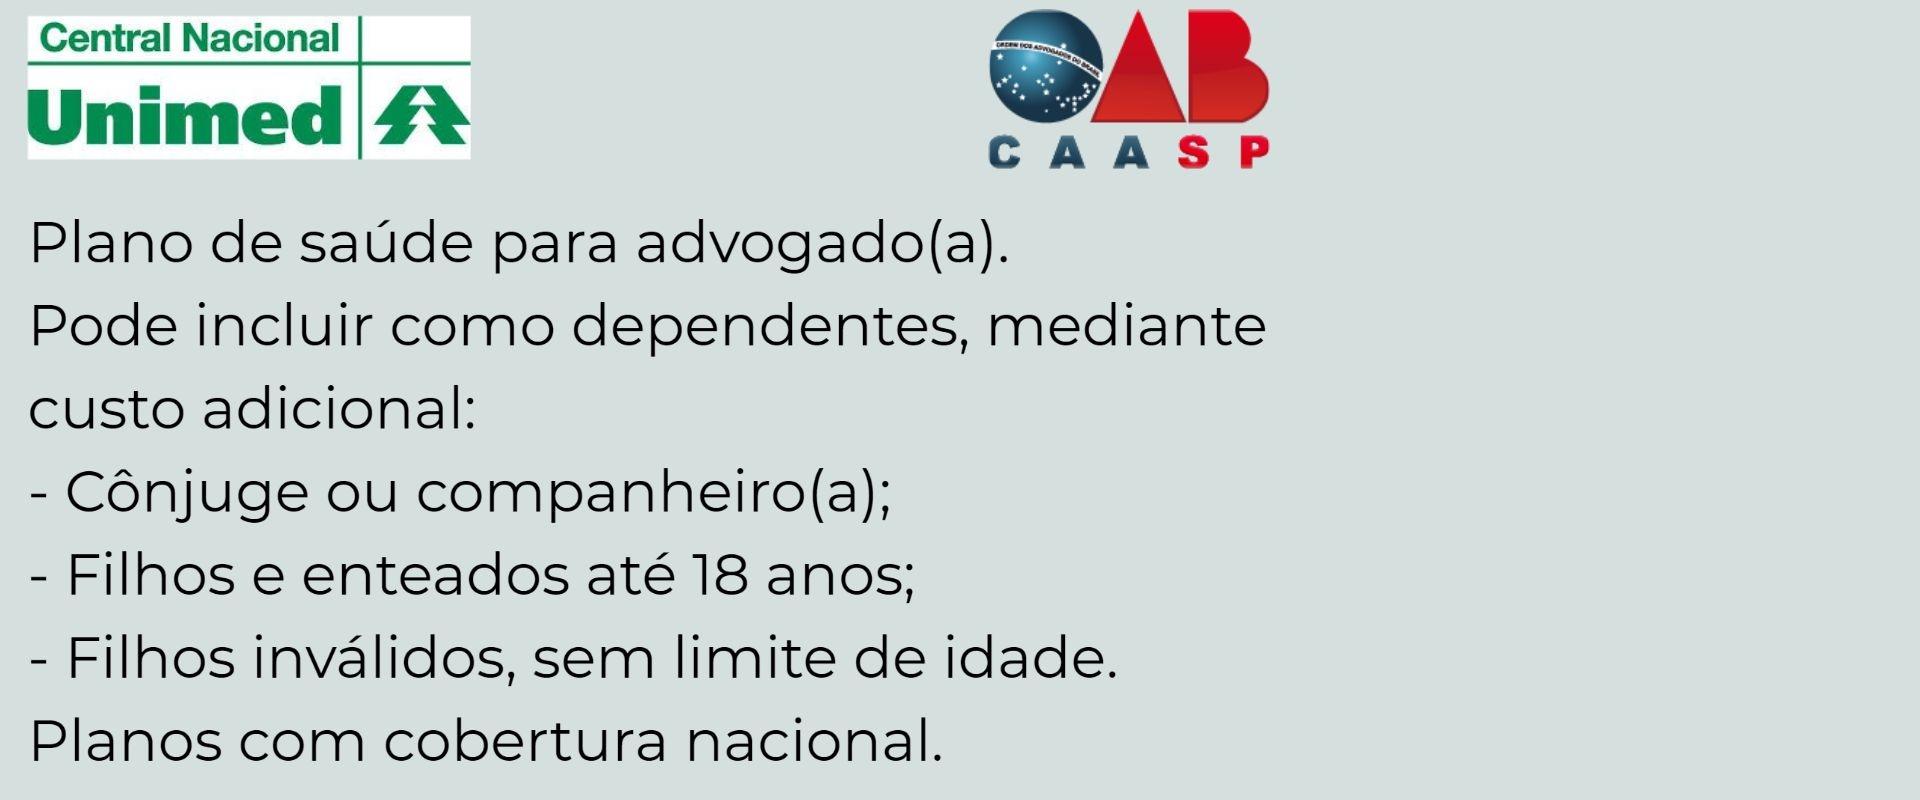 Unimed CAASP Mogi-Guaçu